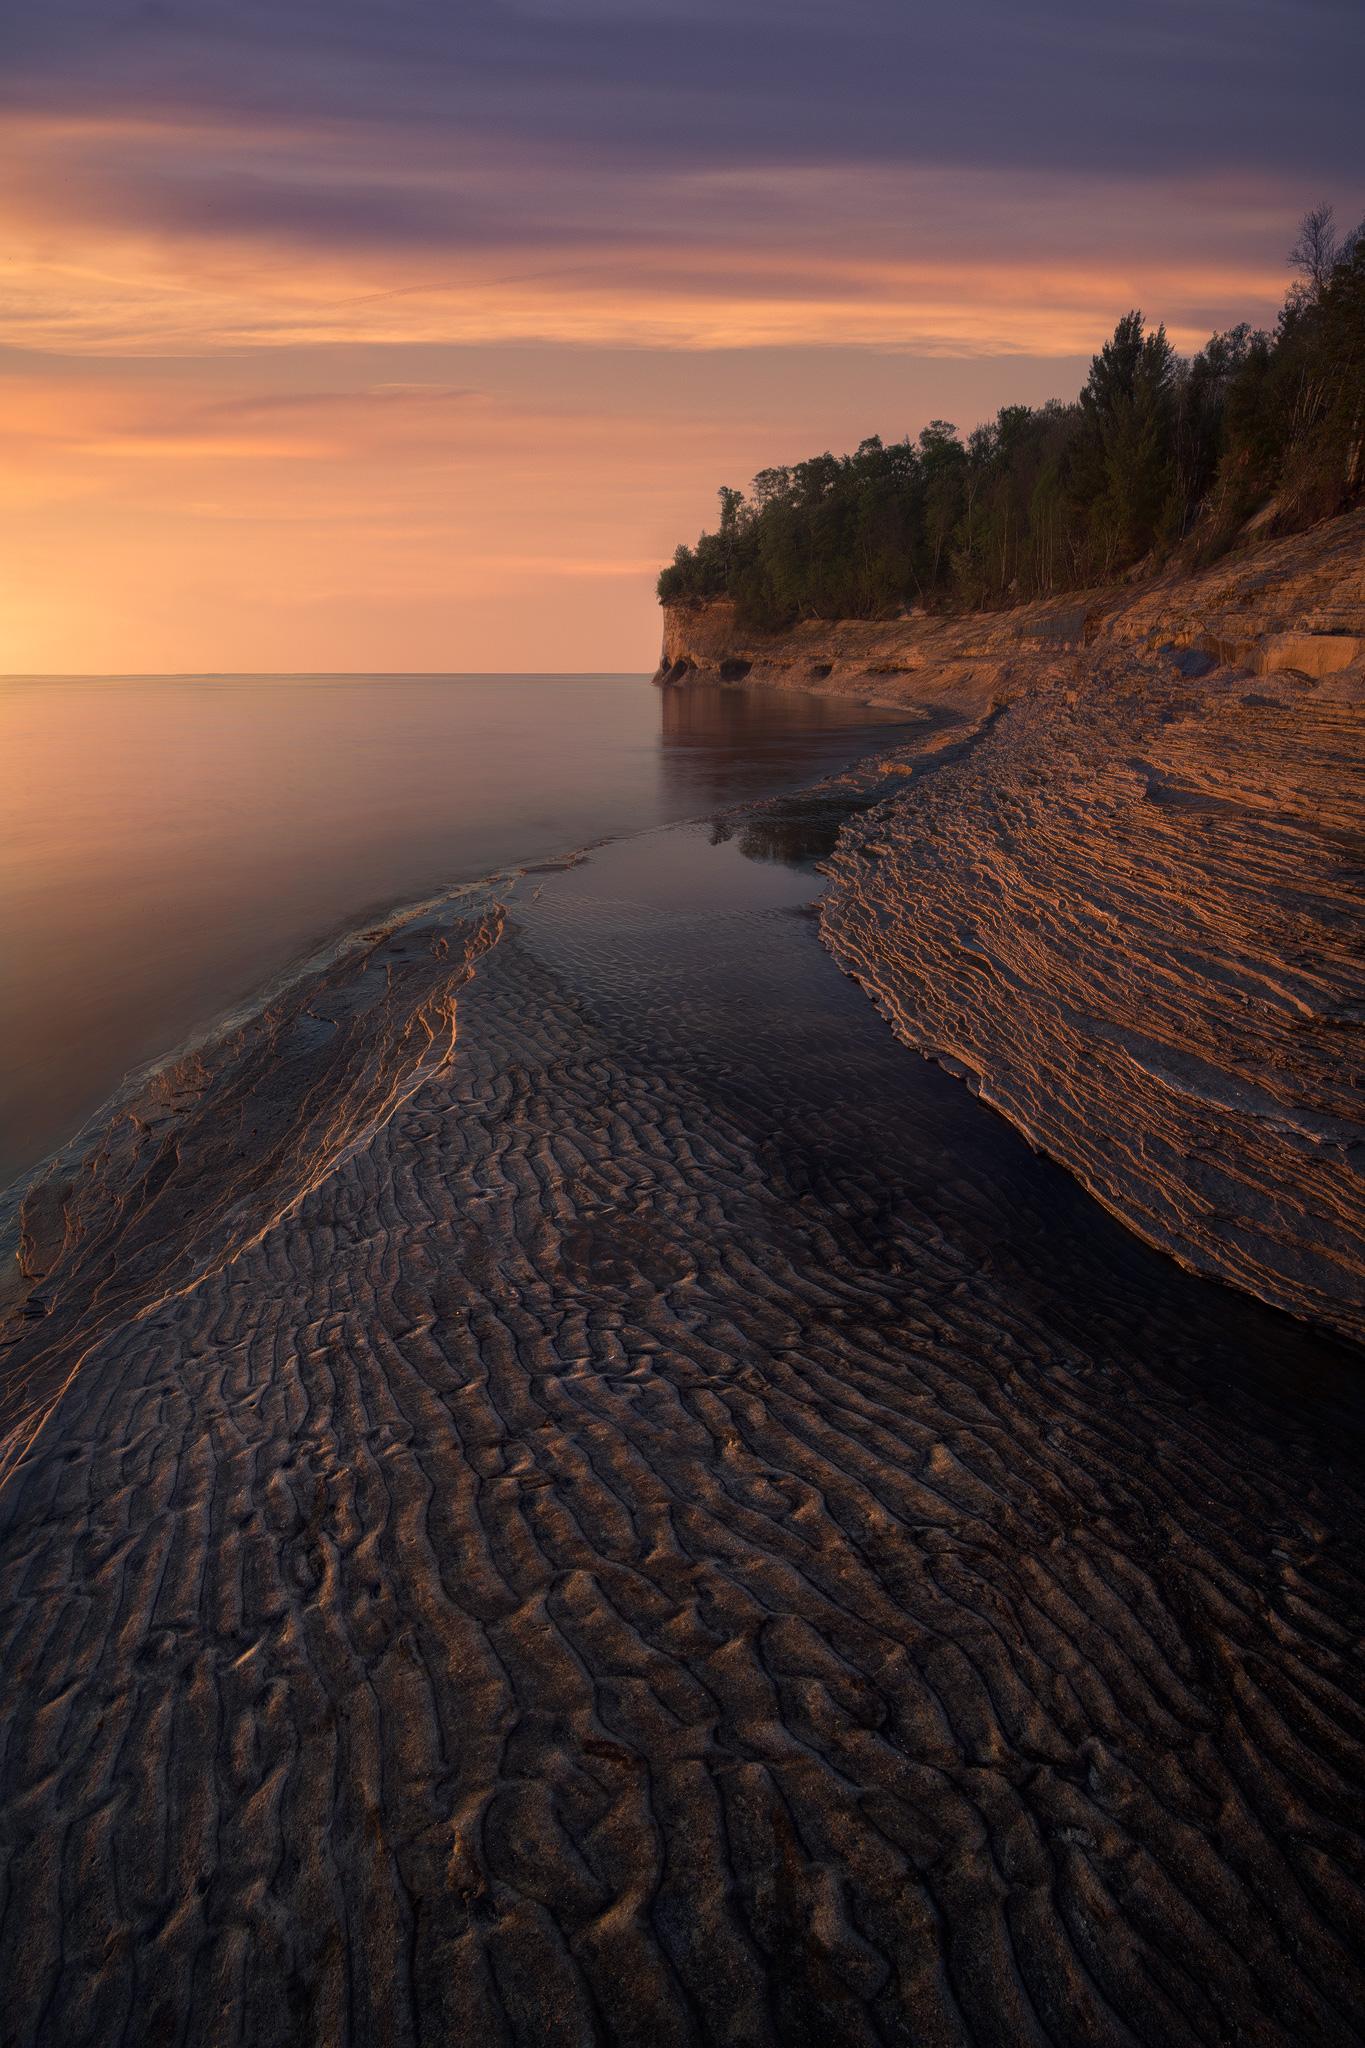 """Jurassic Coast""    Irix 11mm, Pictured Rocks National Lakeshore 2018"